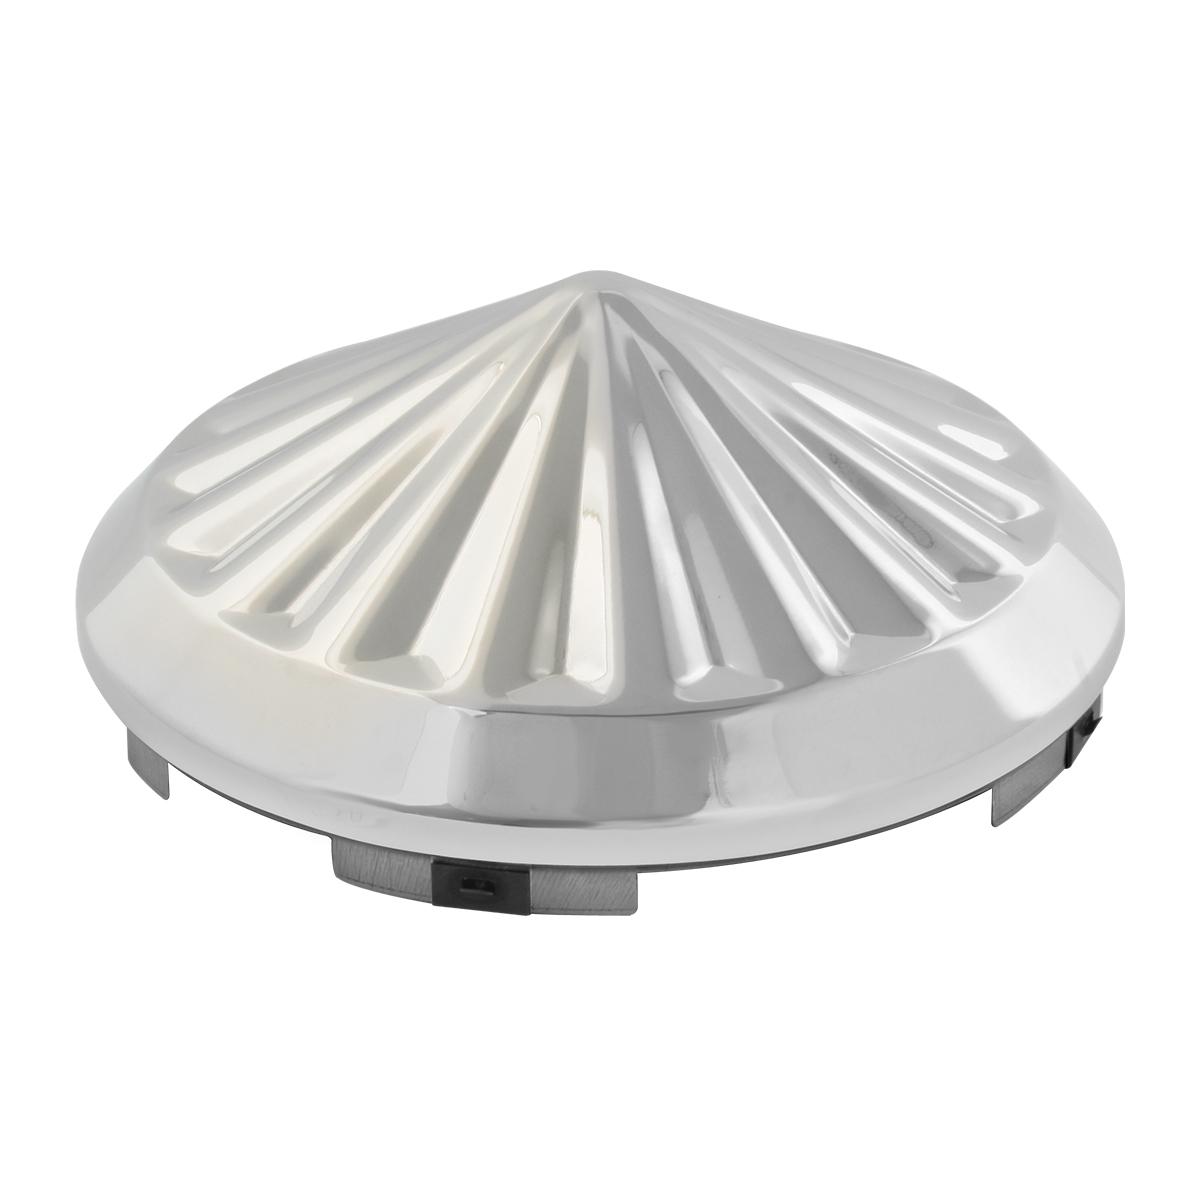 10703/10704 Universal Front Hub Cap in Pin Wheel Shape